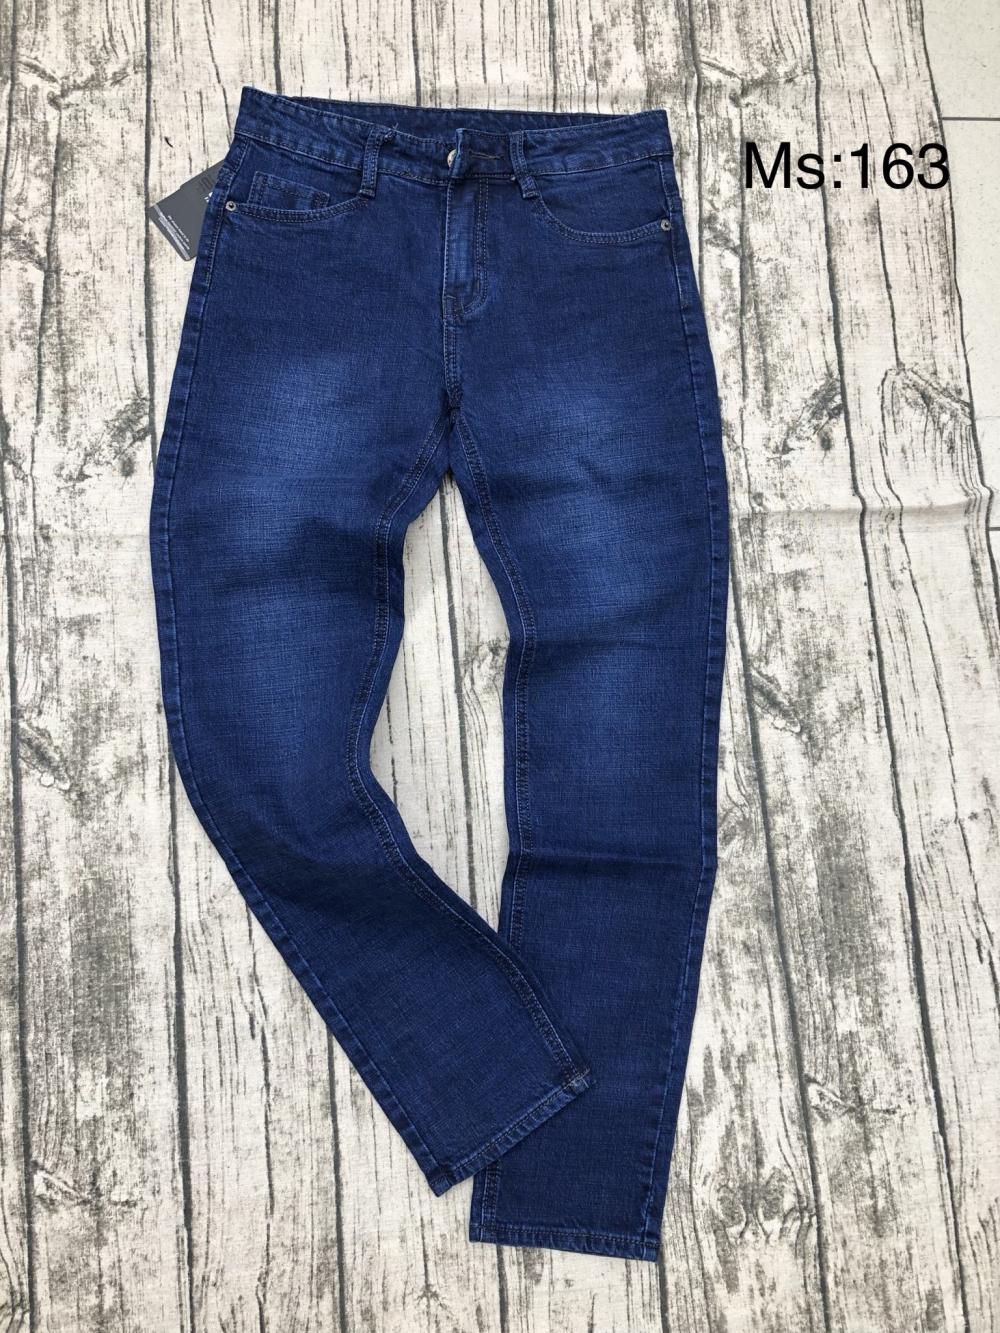 Quần jean nam dài MS163